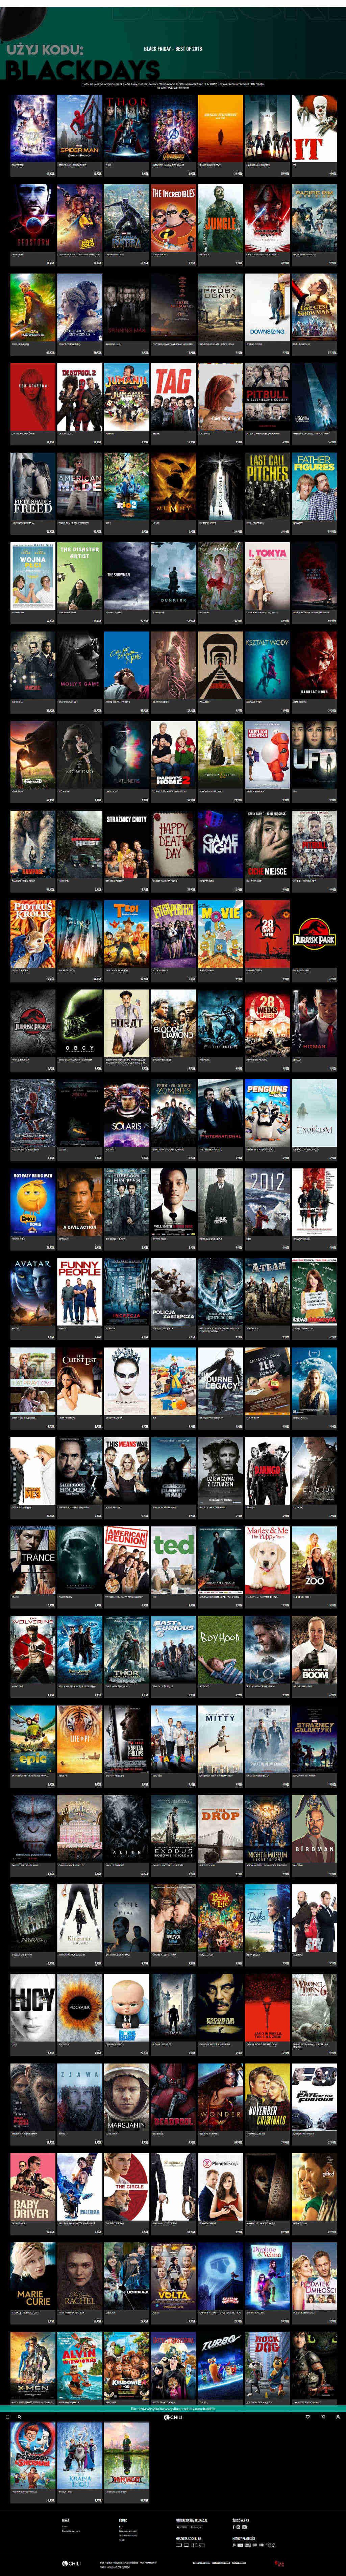 CHILI-black-fridays-movies-list